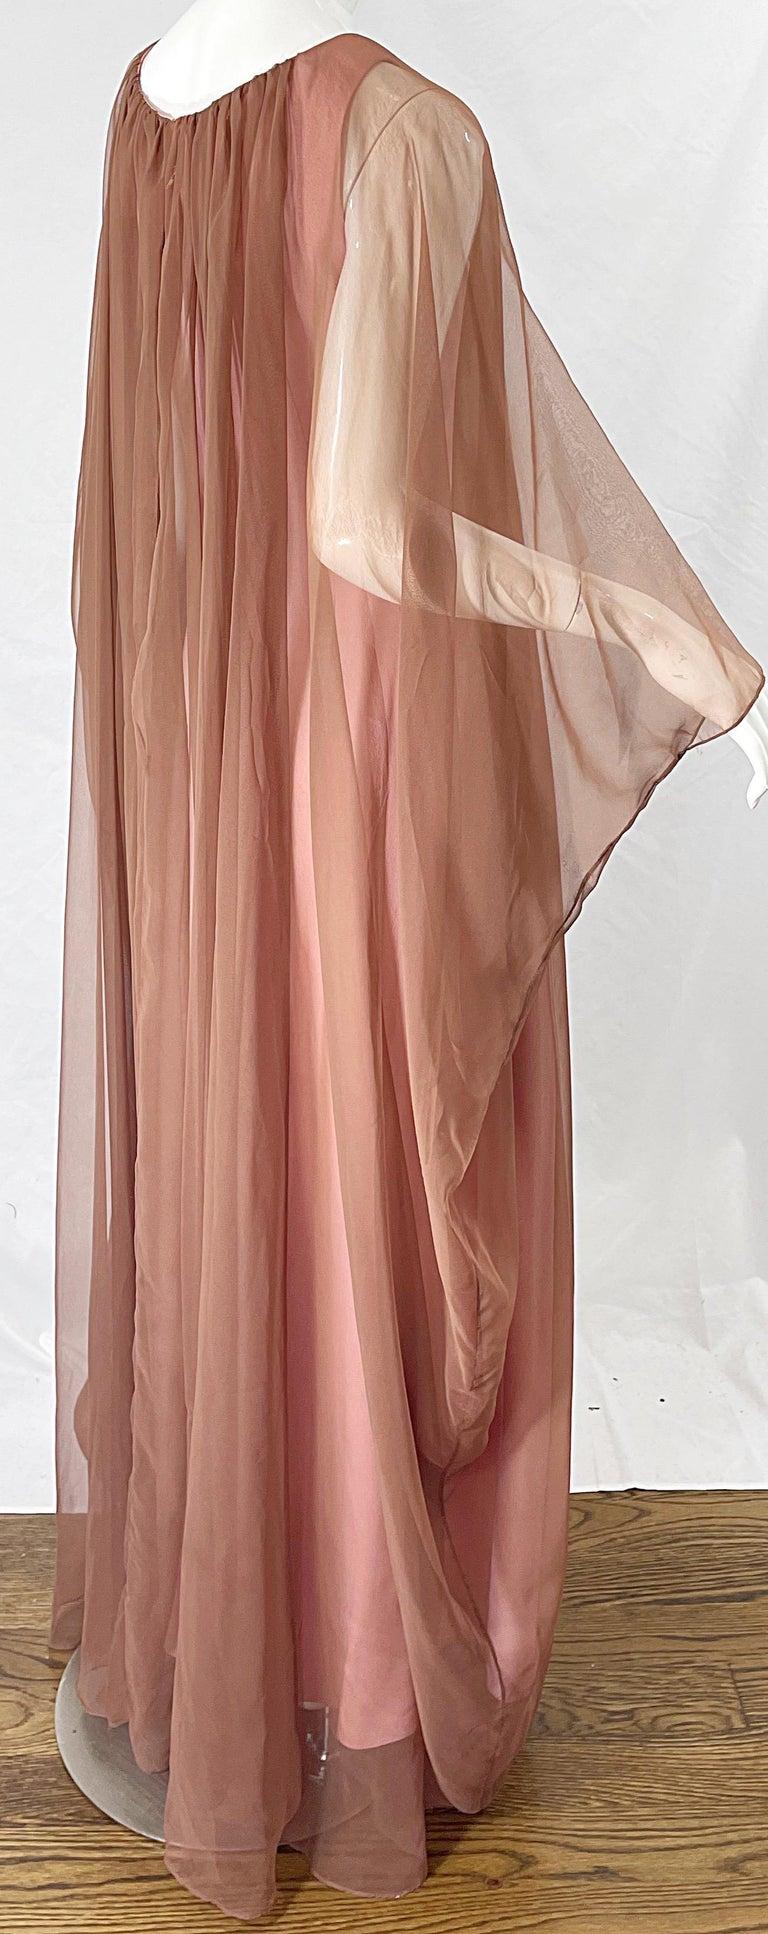 1970s Estevez Pink + Nude Brown Chiffon Caftan Vintage 70s Kaftan Maxi Dress For Sale 5